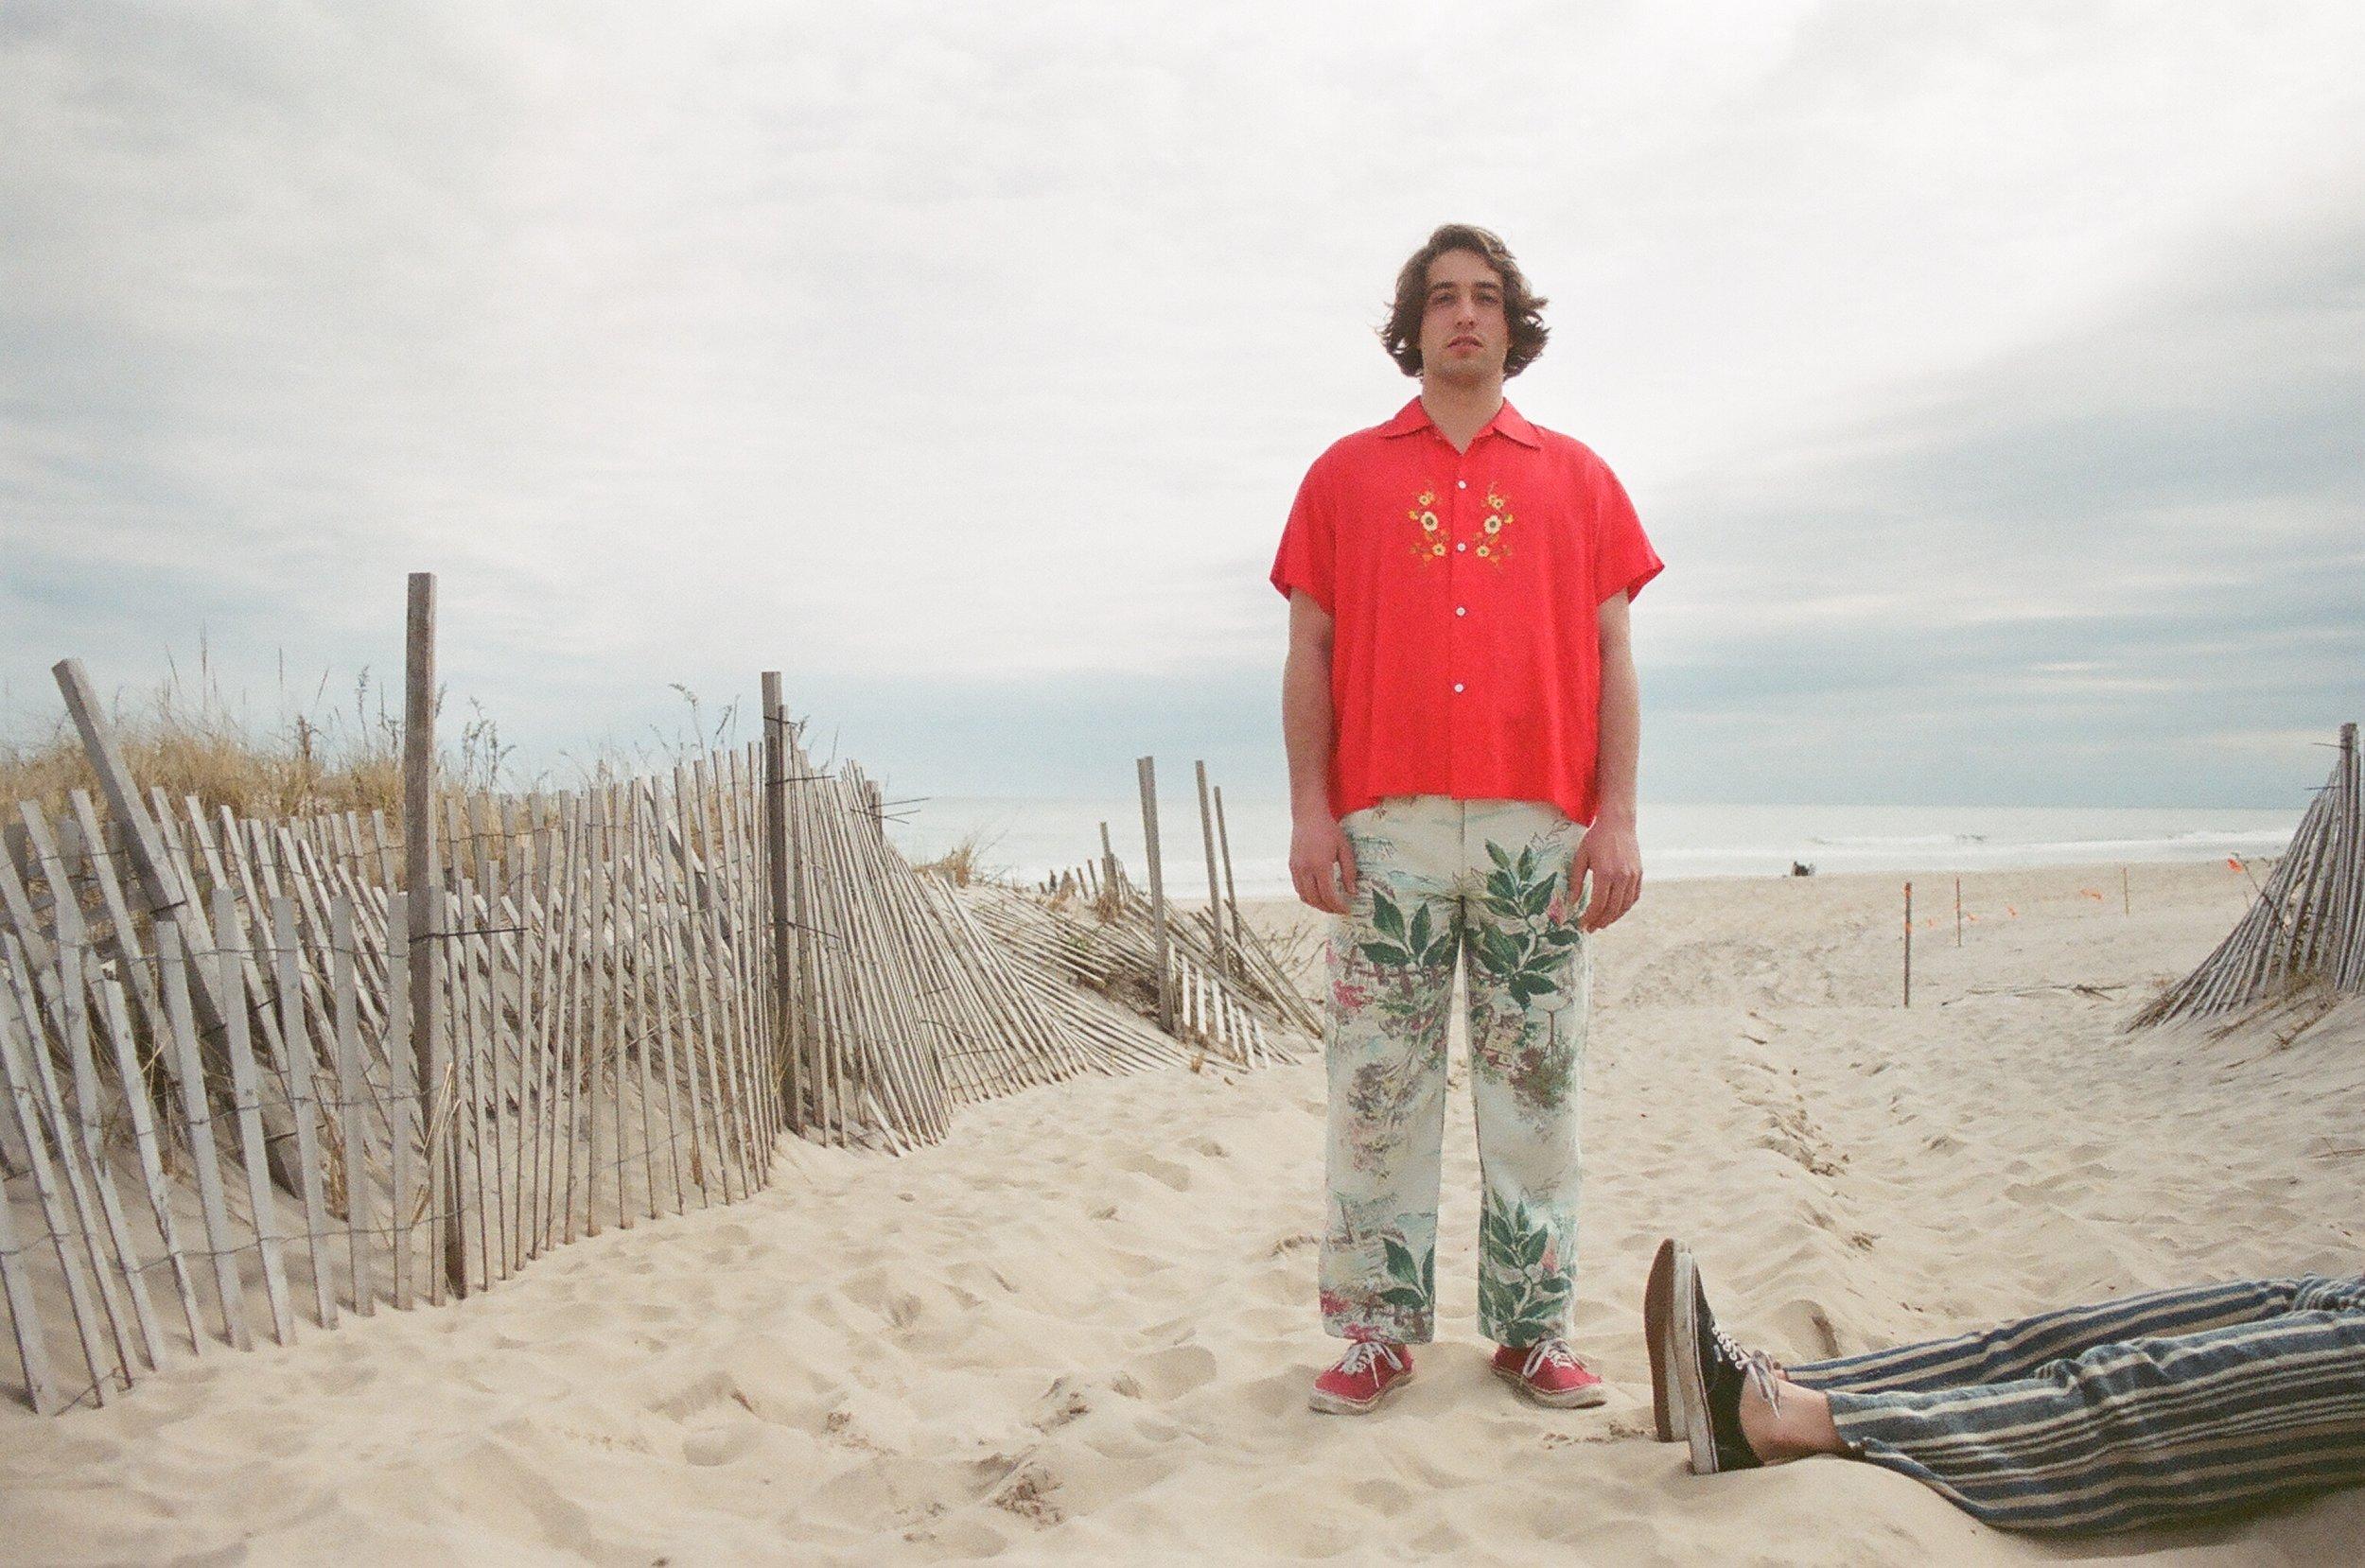 Chelsy-Mitchel-photographer-bode-nyc-fashion-beach-editorial-beachside.JPG